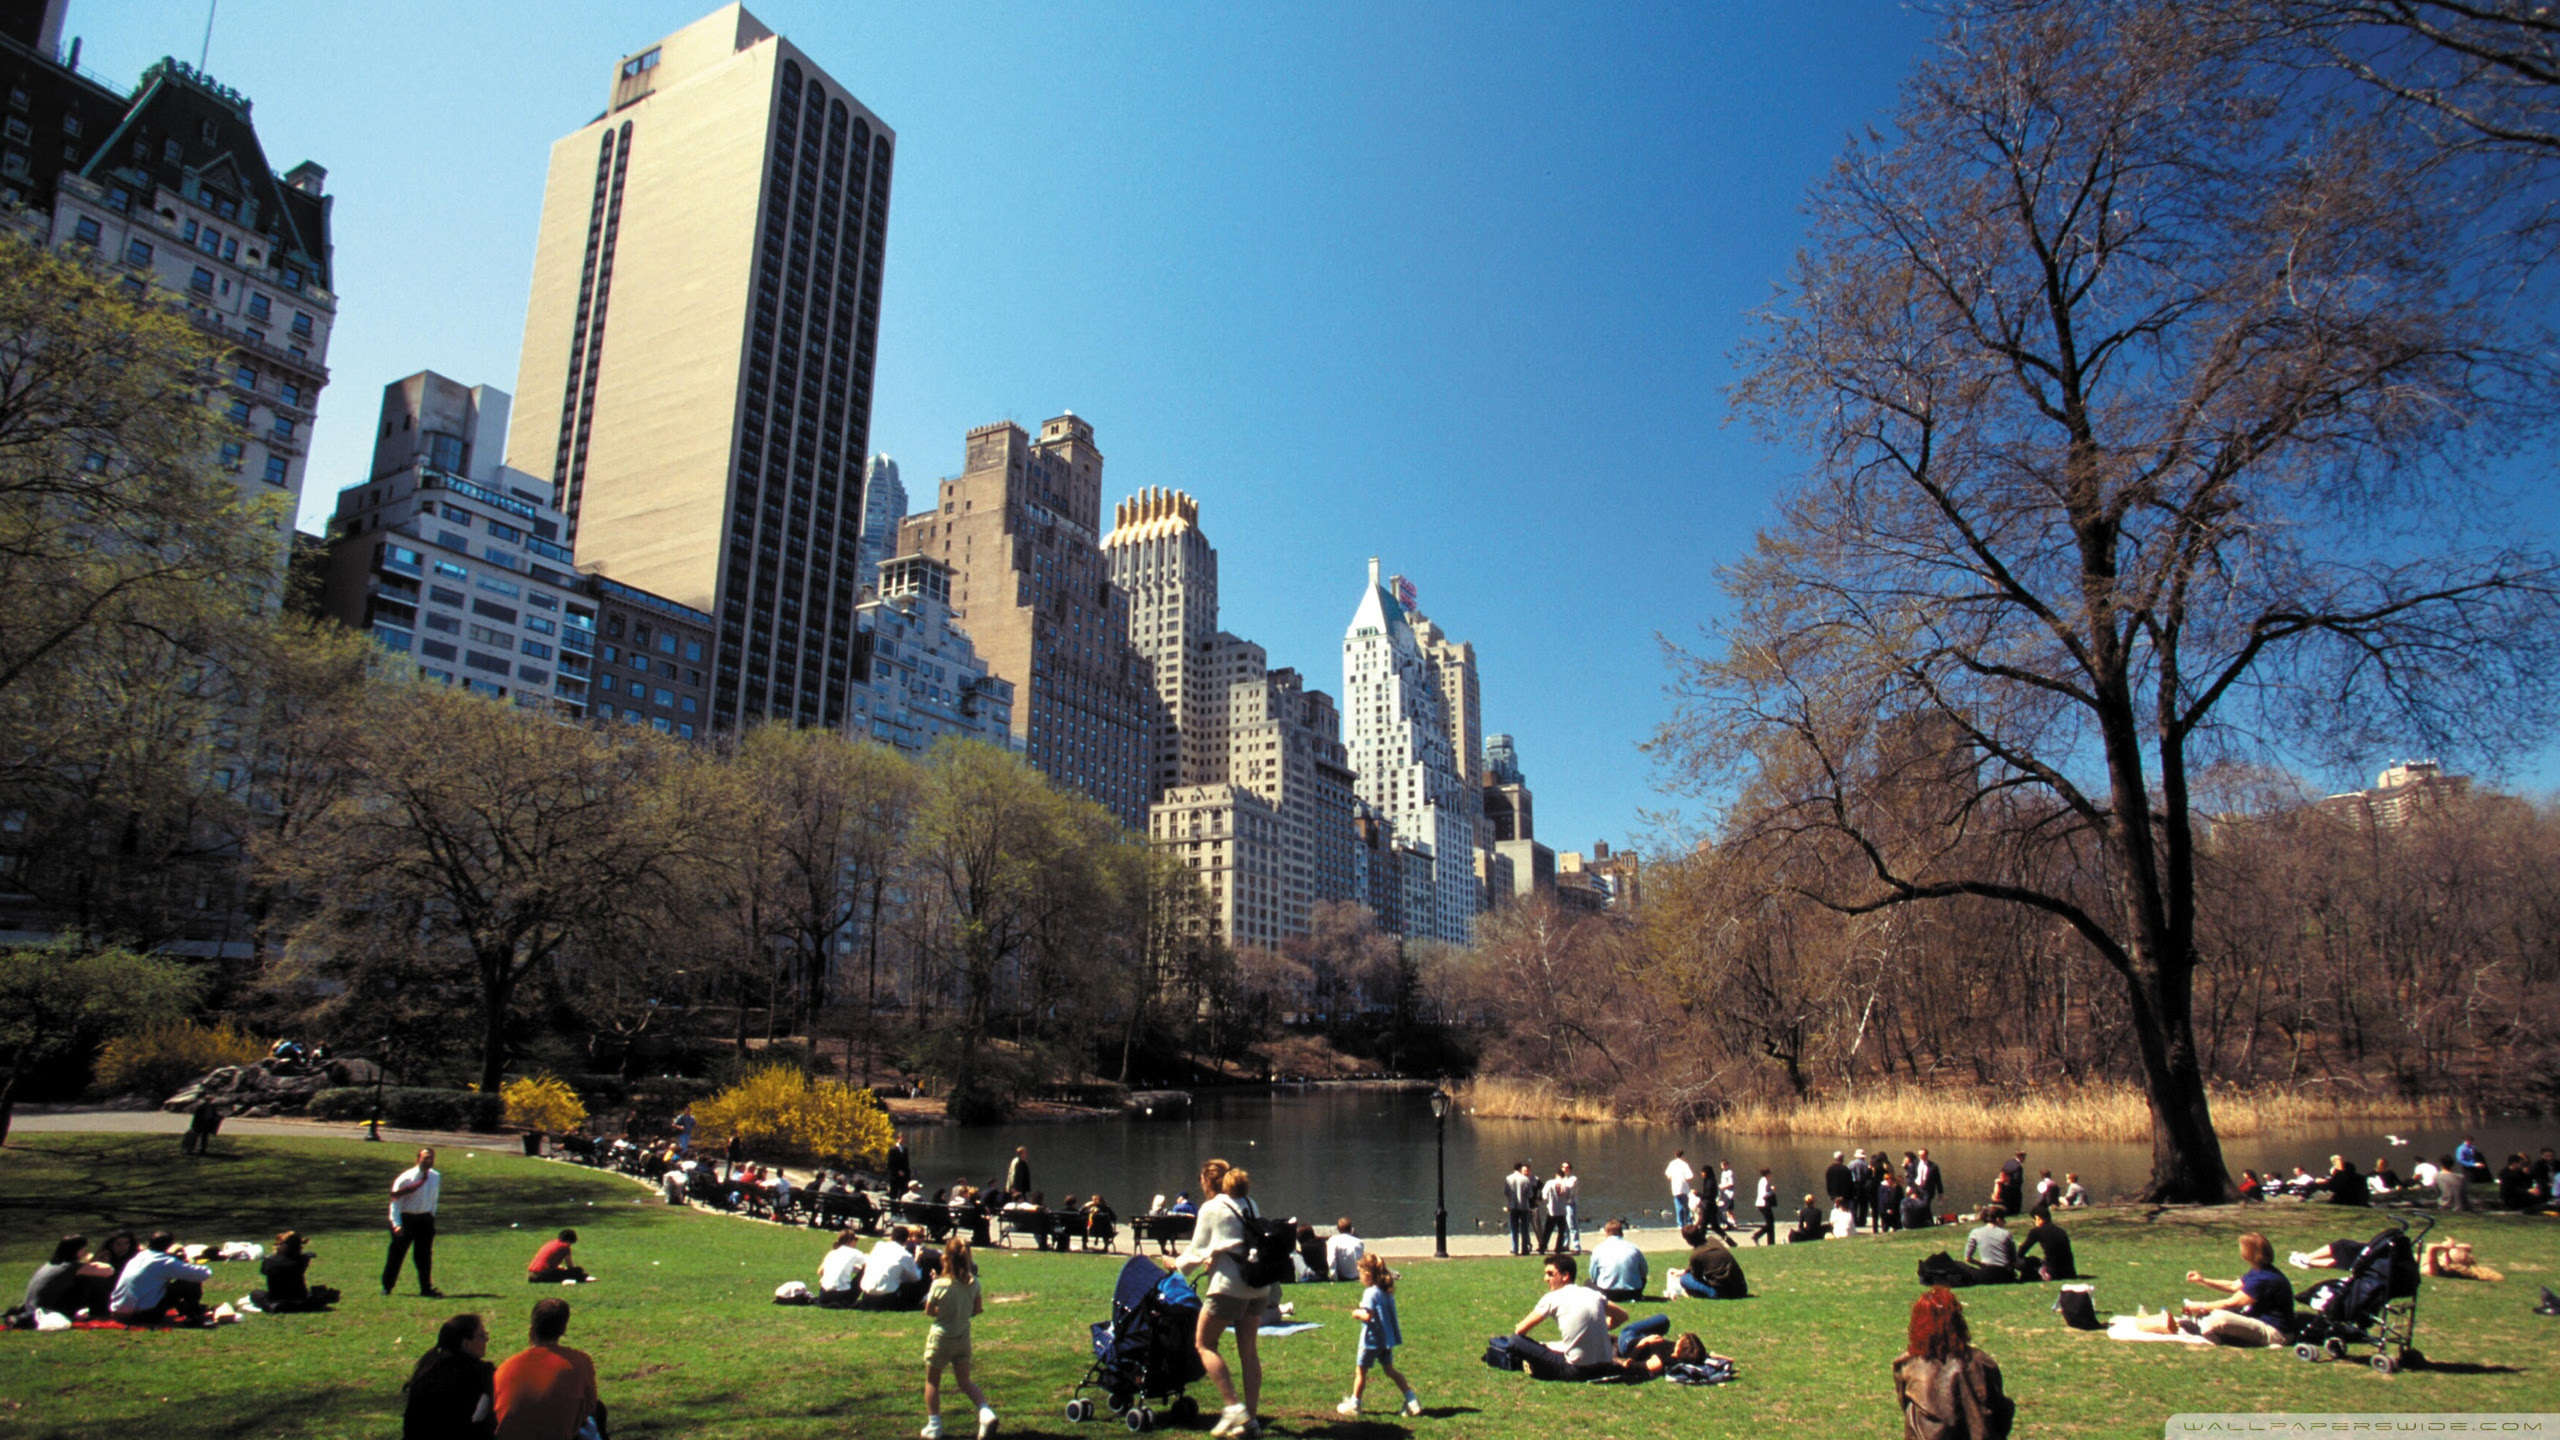 Central Park Wallpaper 2560x1440 77627